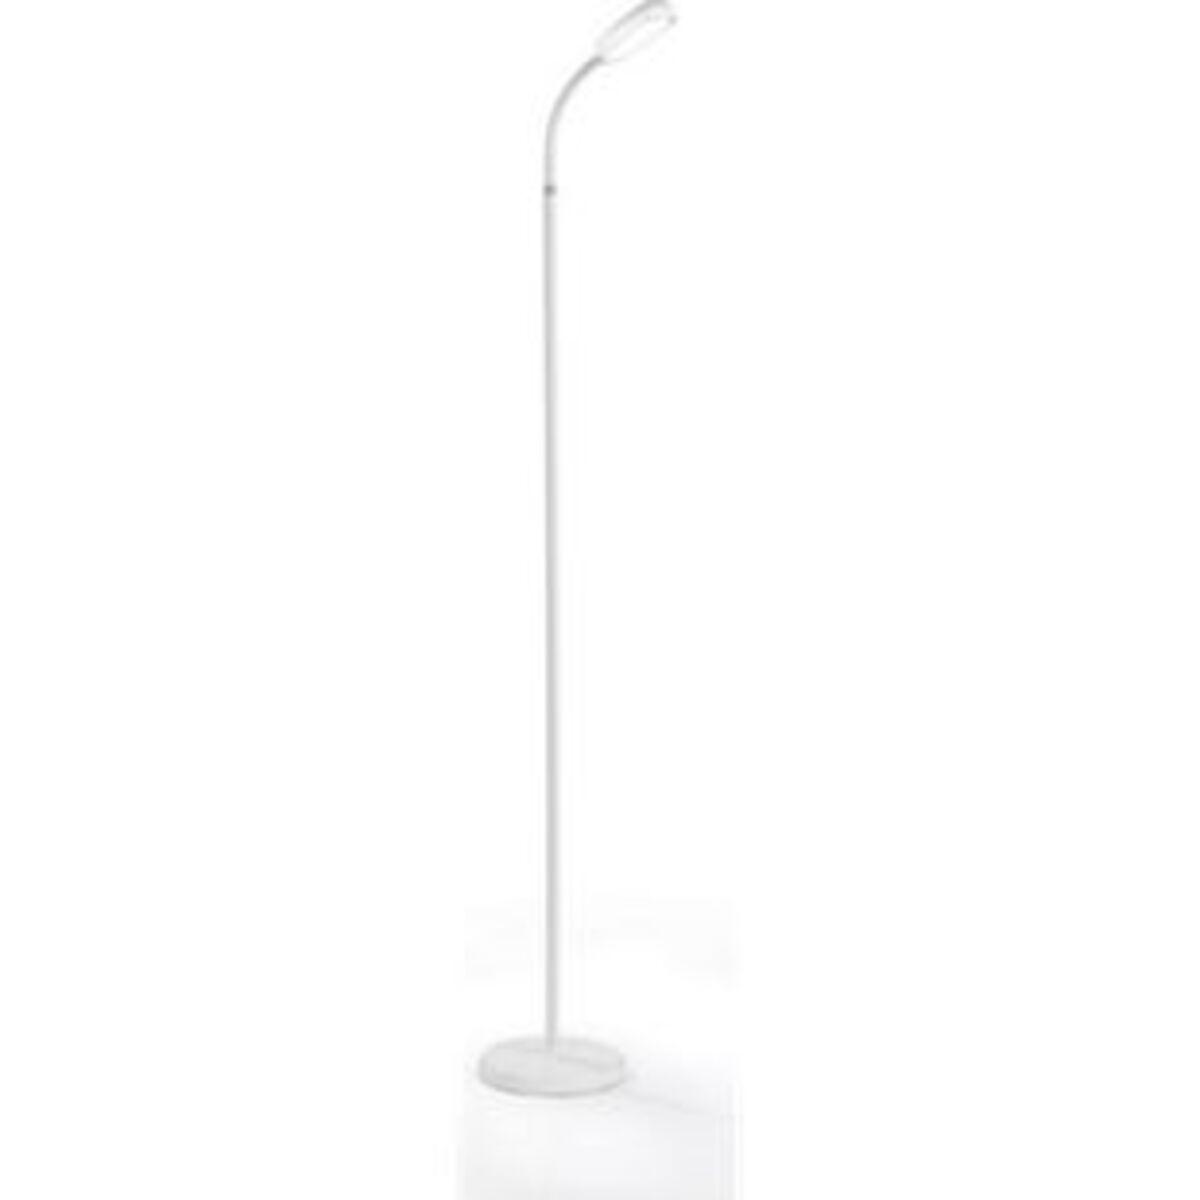 Bild 2 von EASYmaxx LED-Standleuchte Daylight 5V weiß Micro-USB 5000mAh